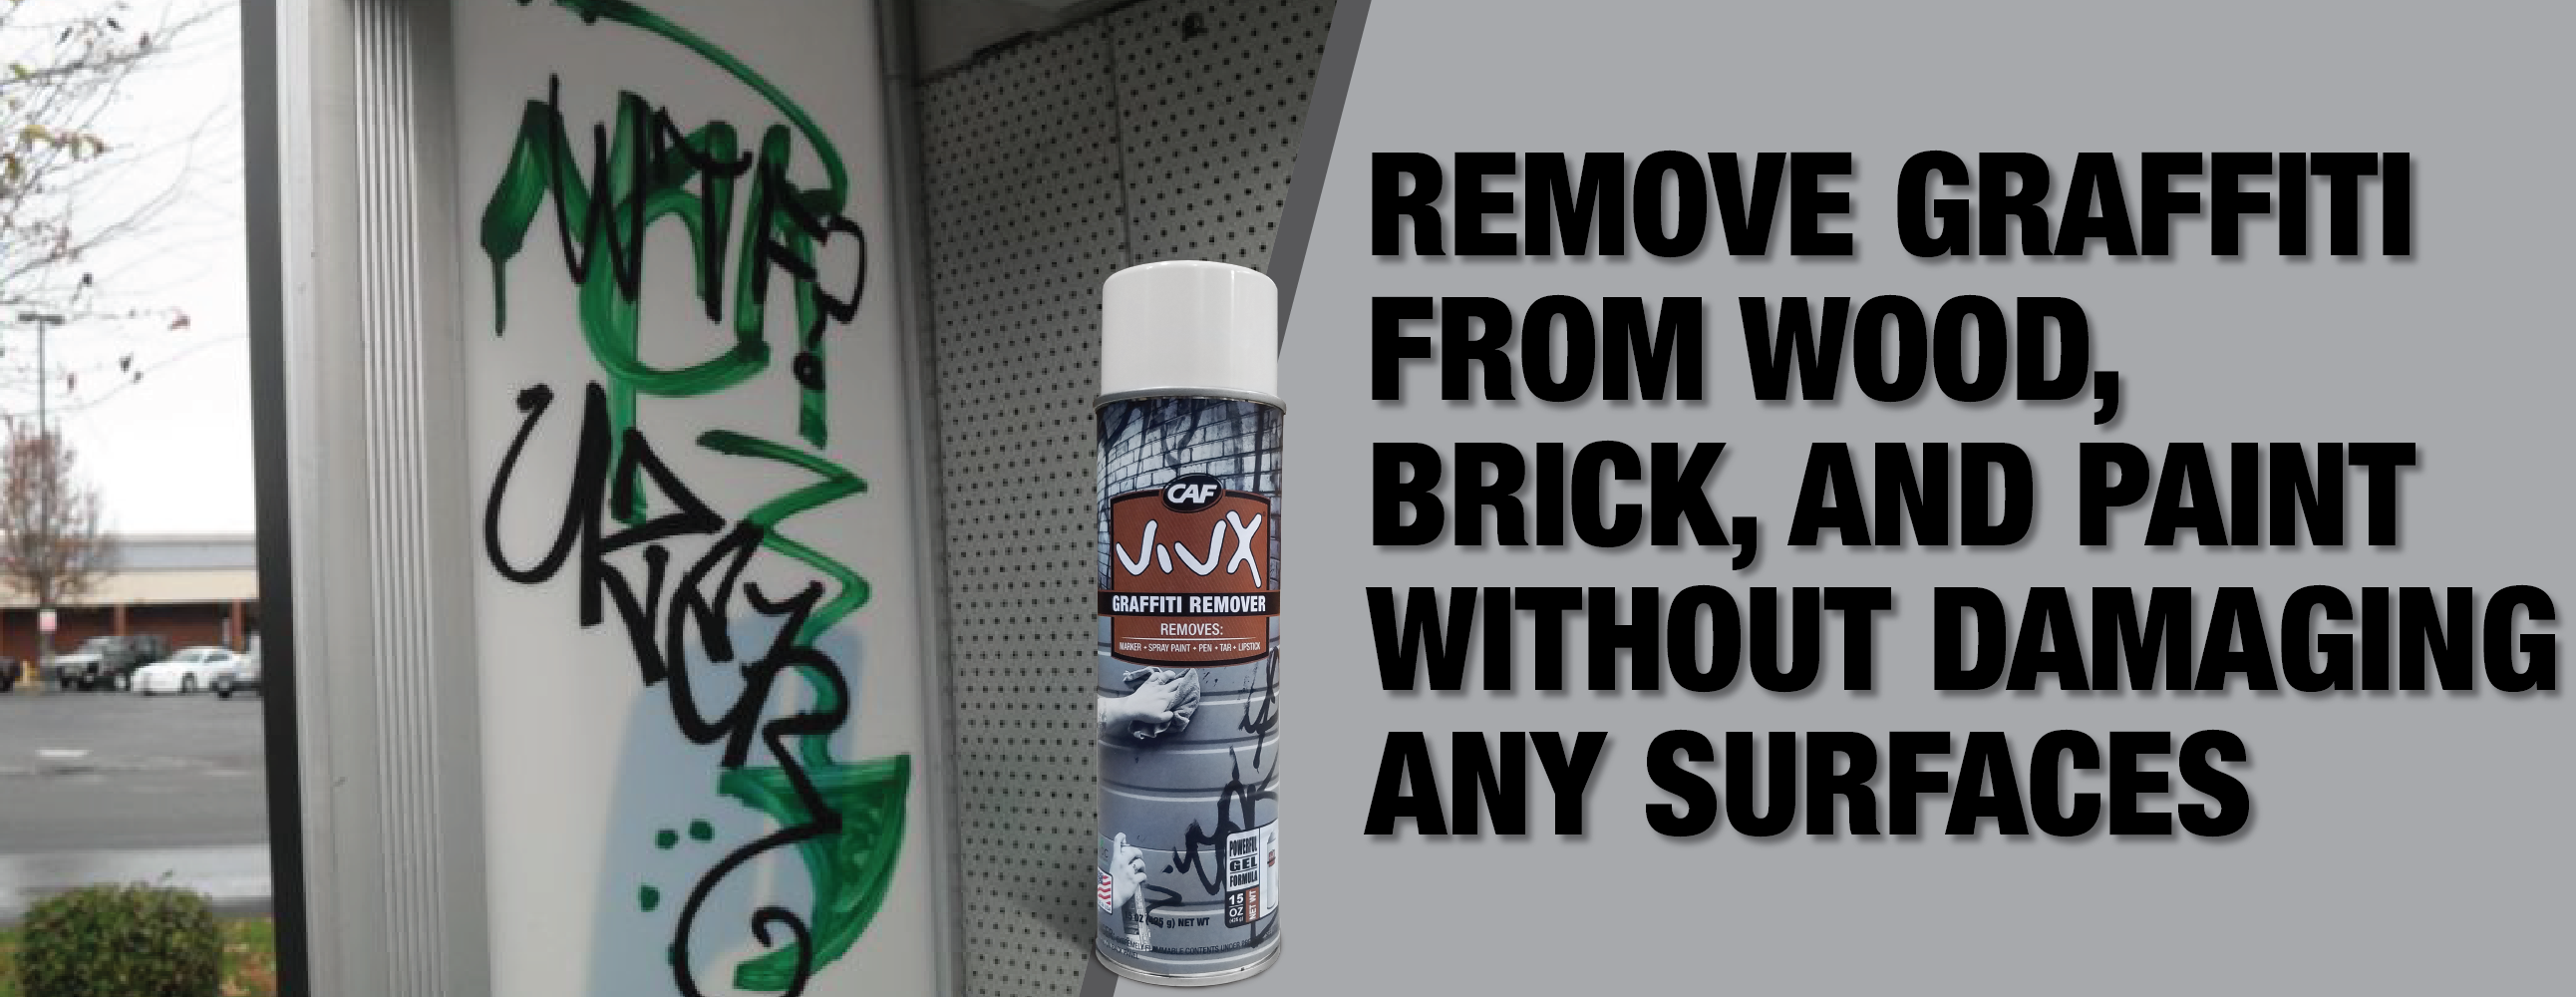 Need a solution for graffiti? Get VIVX Graffiti Remover!